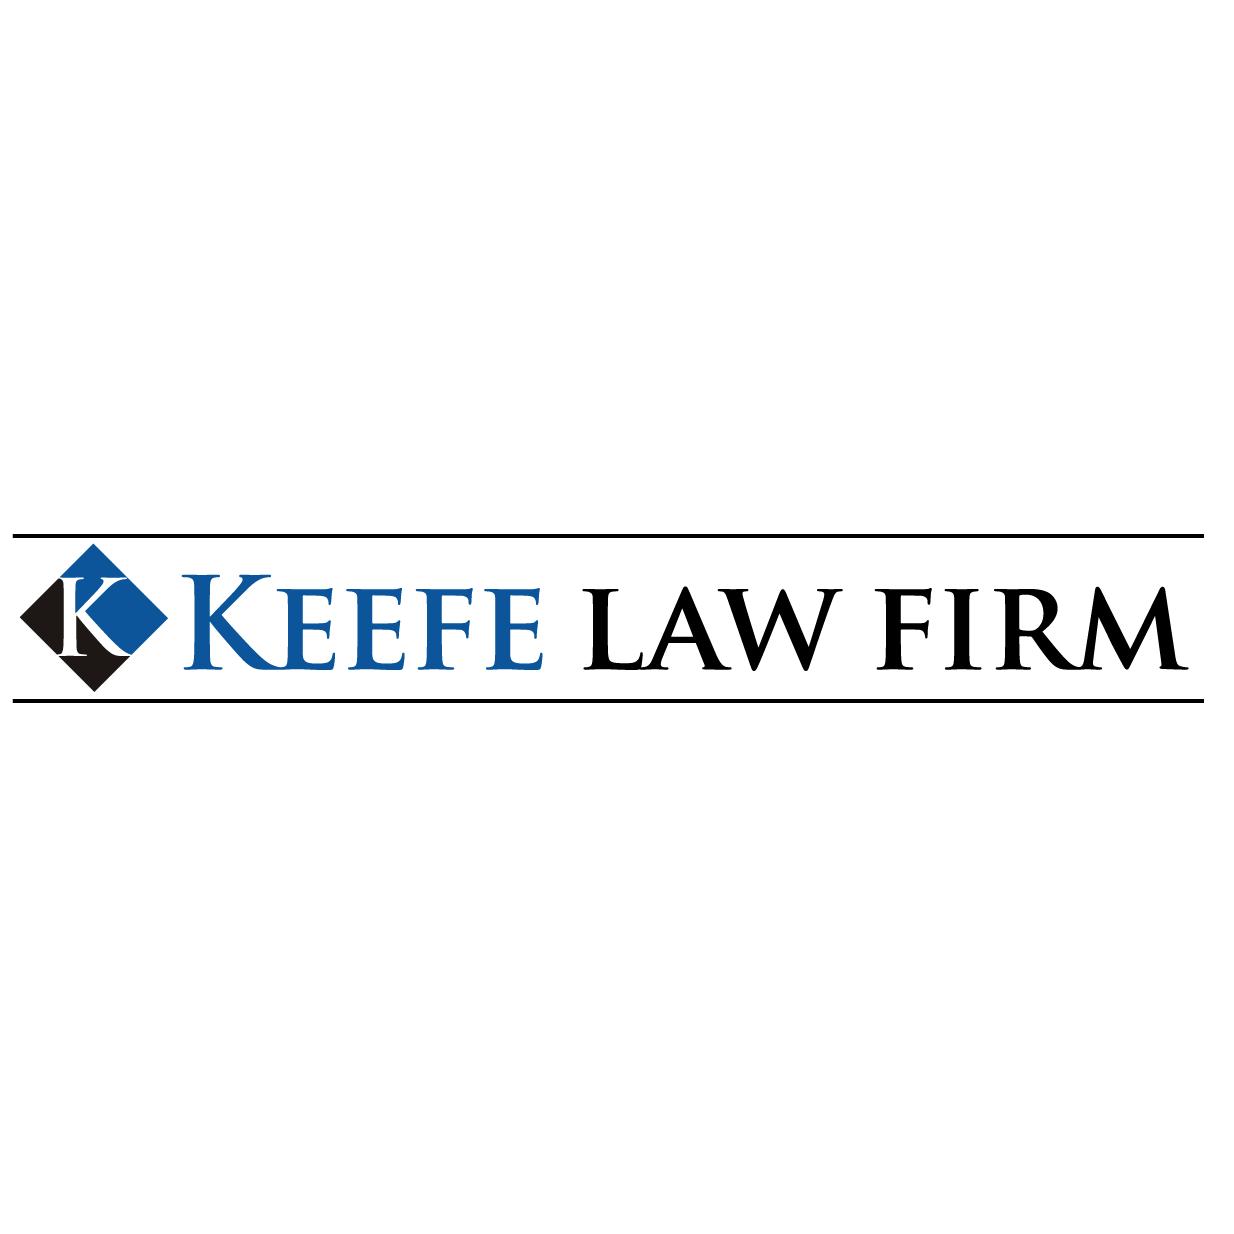 Keefe Law Firm - New Brunswick, NJ - Attorneys